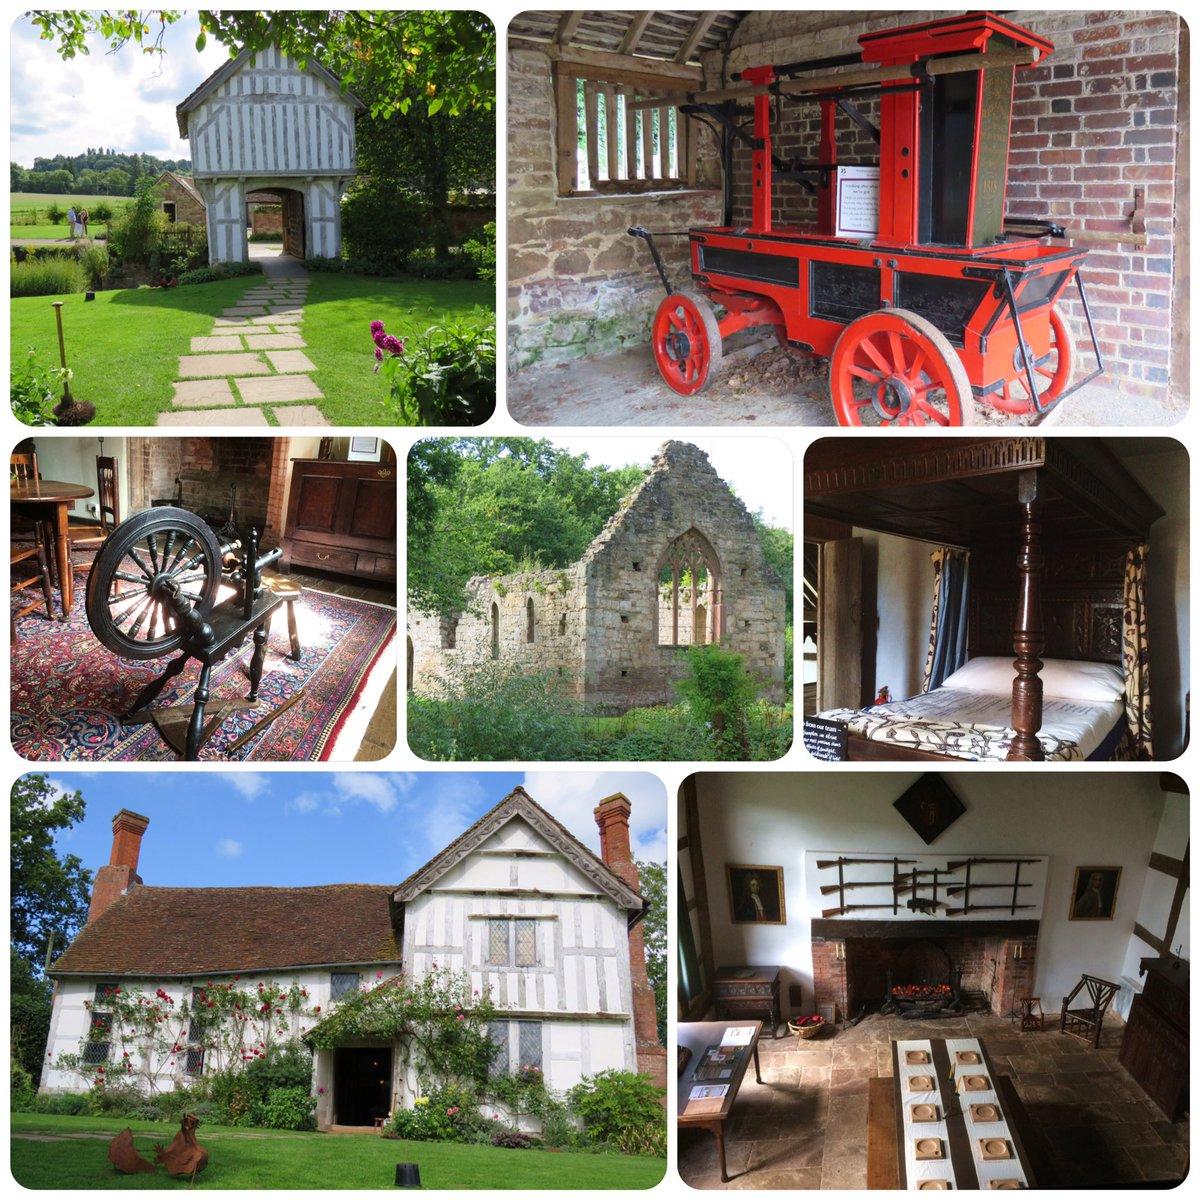 Wander around #Brockhampton with me - a wonderful medieval moated manor  https:// lynnejmorley.blogspot.com/2017/09/brockh ampton-medieval-manor.html &nbsp; …  #BROCKHAMPTON #medieval #moat #NT<br>http://pic.twitter.com/te9ZPtYAuY